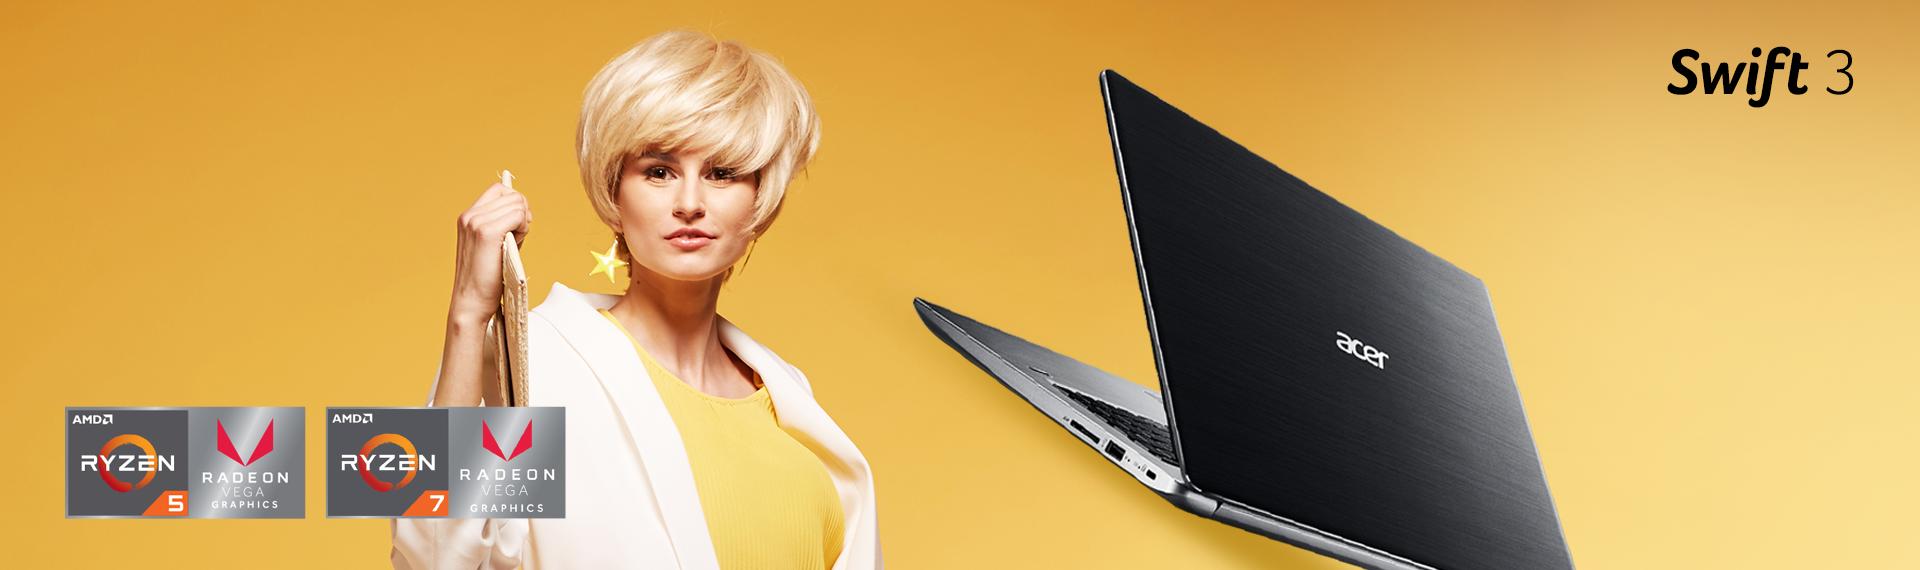 Keren, Laptop Acer Ini Tipis Tapi Kinerjanya Kencang!